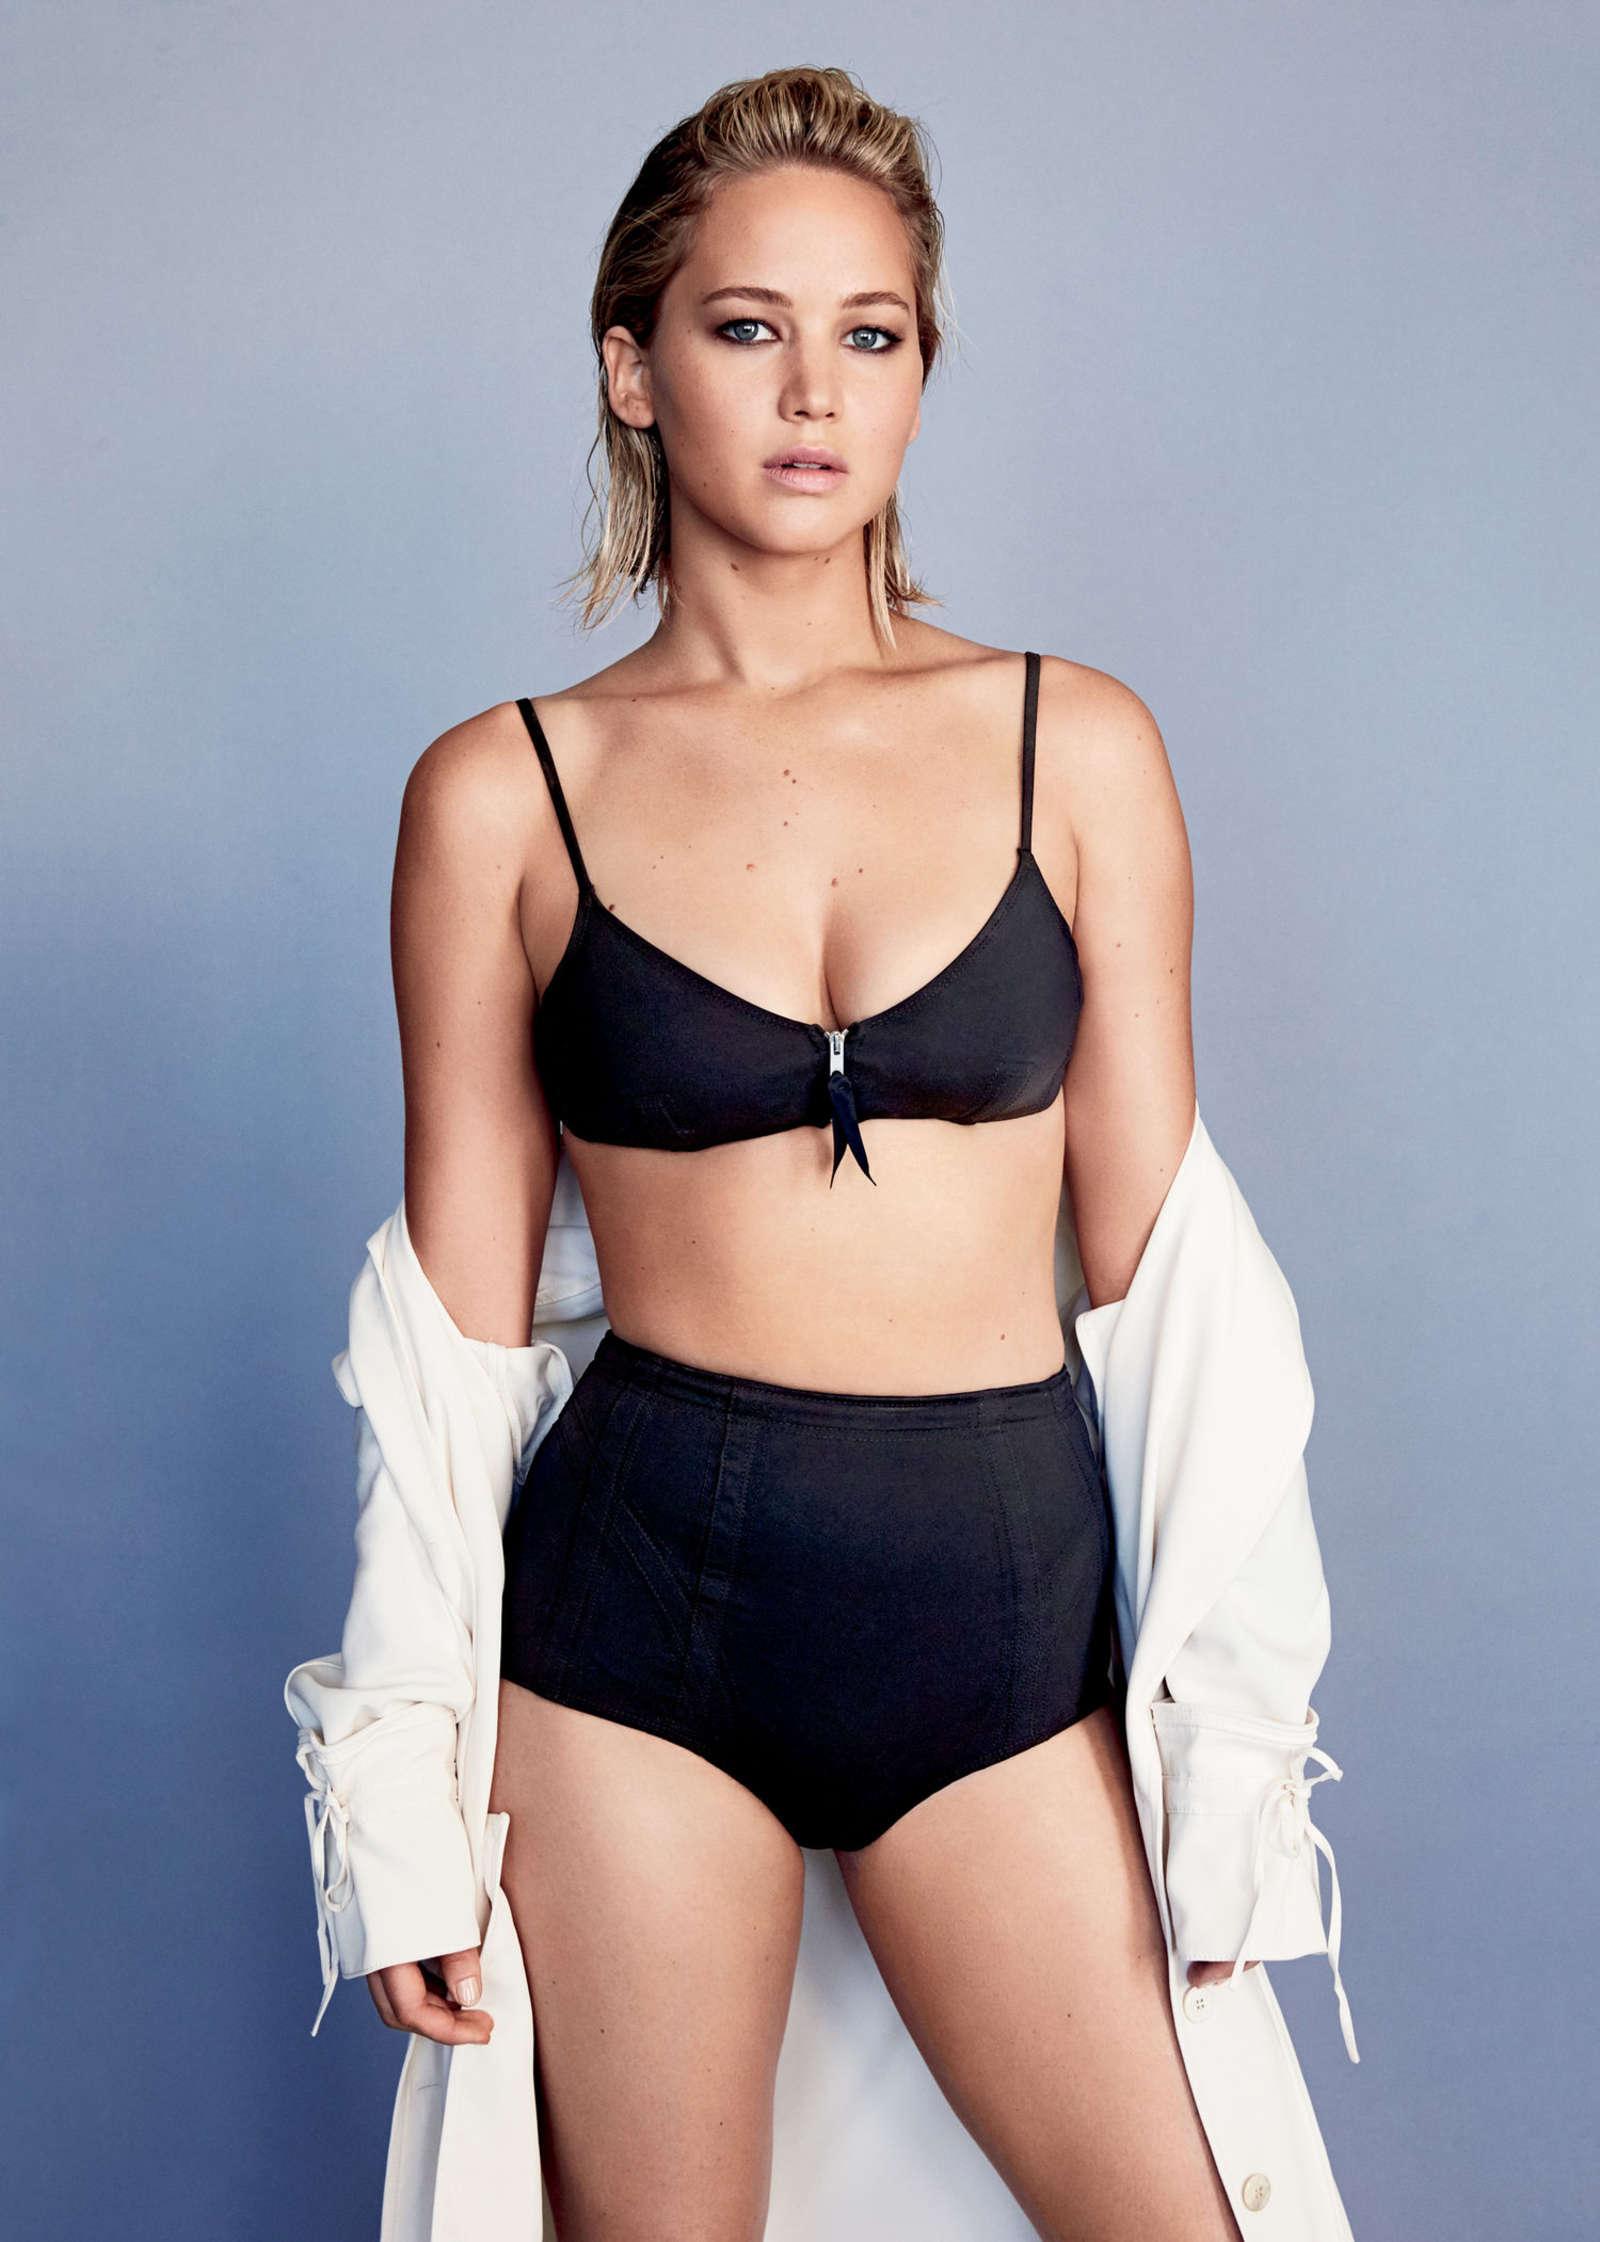 Jennifer-Lawrence-Sexy-3